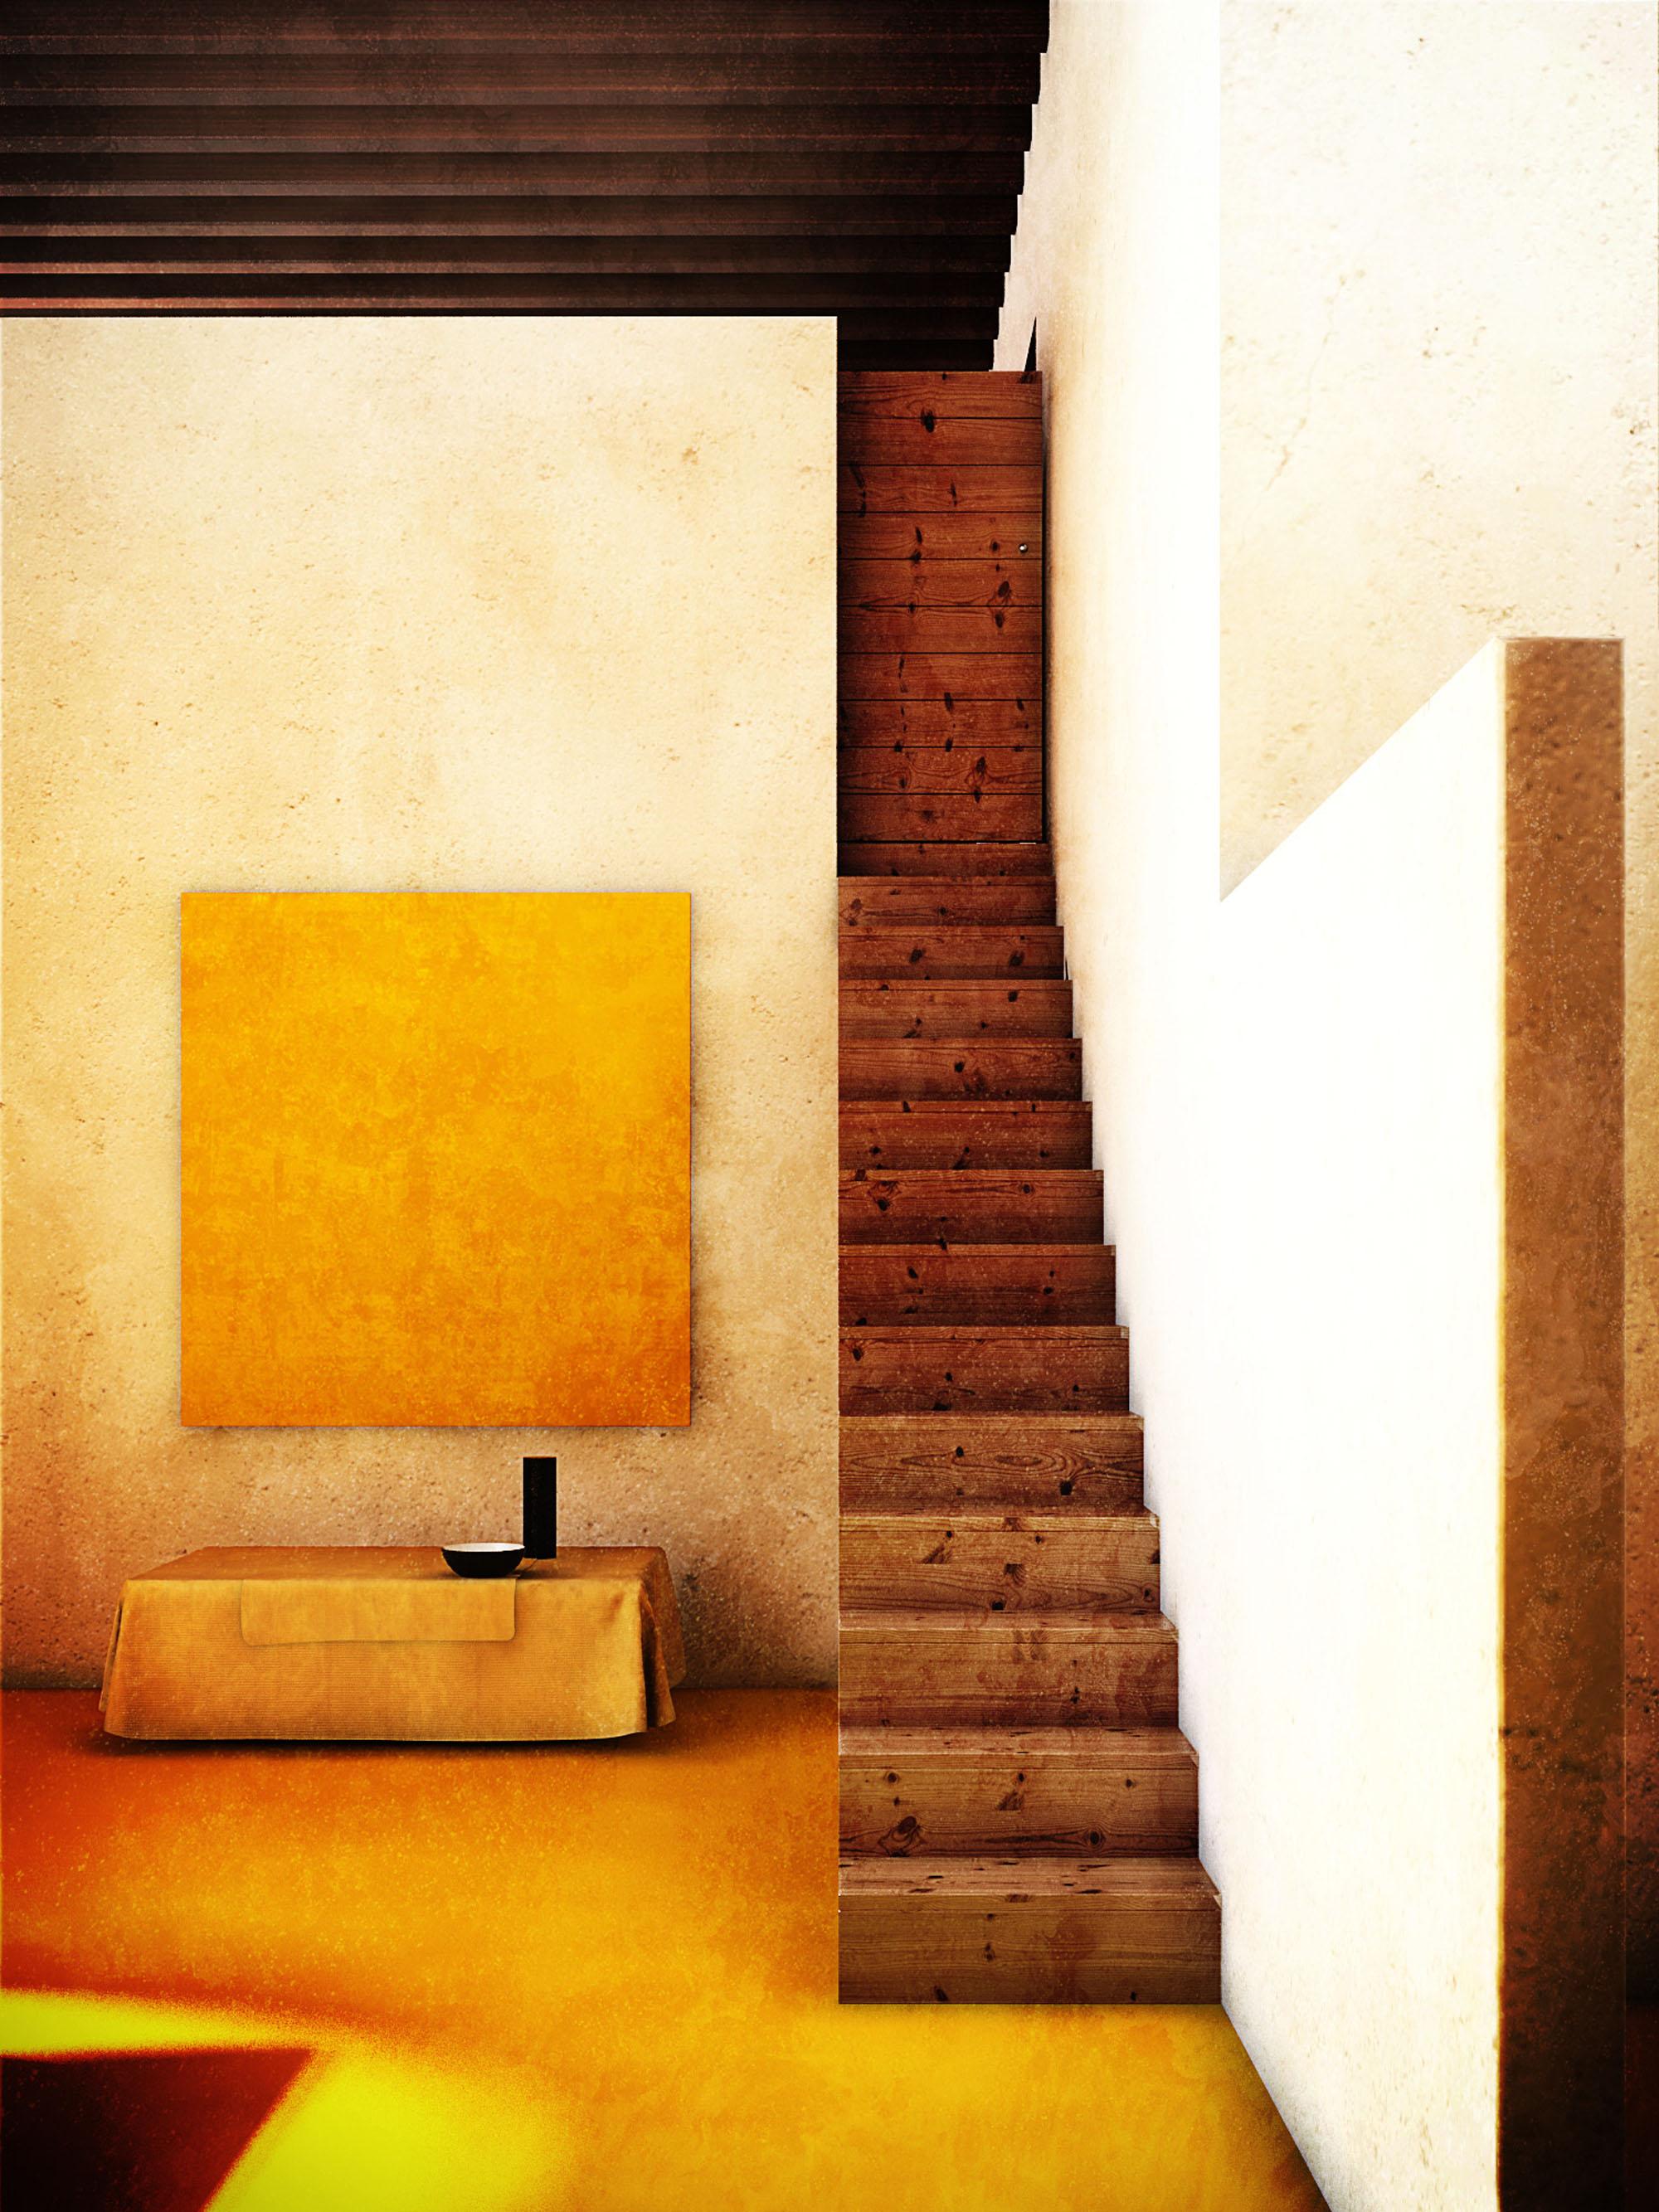 Casa_Barragan_escalator_CGI_by_xoio